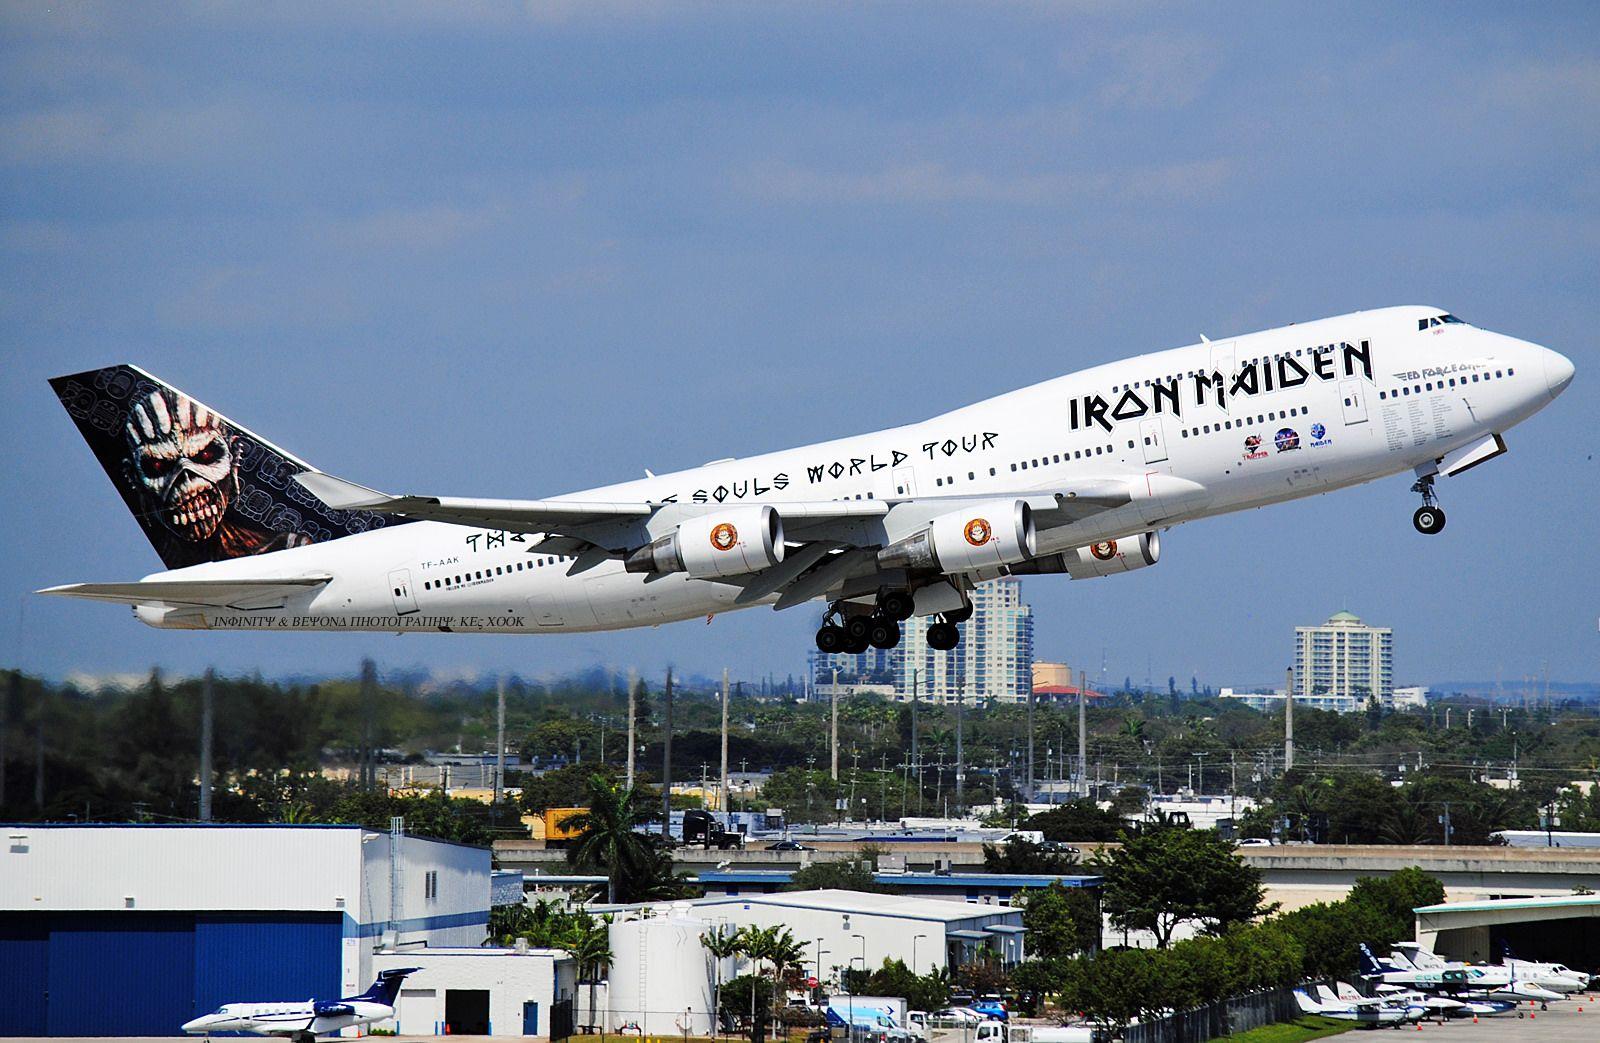 iron maiden 747. fort lauderdale. | cool planes | pinterest | flugzeug